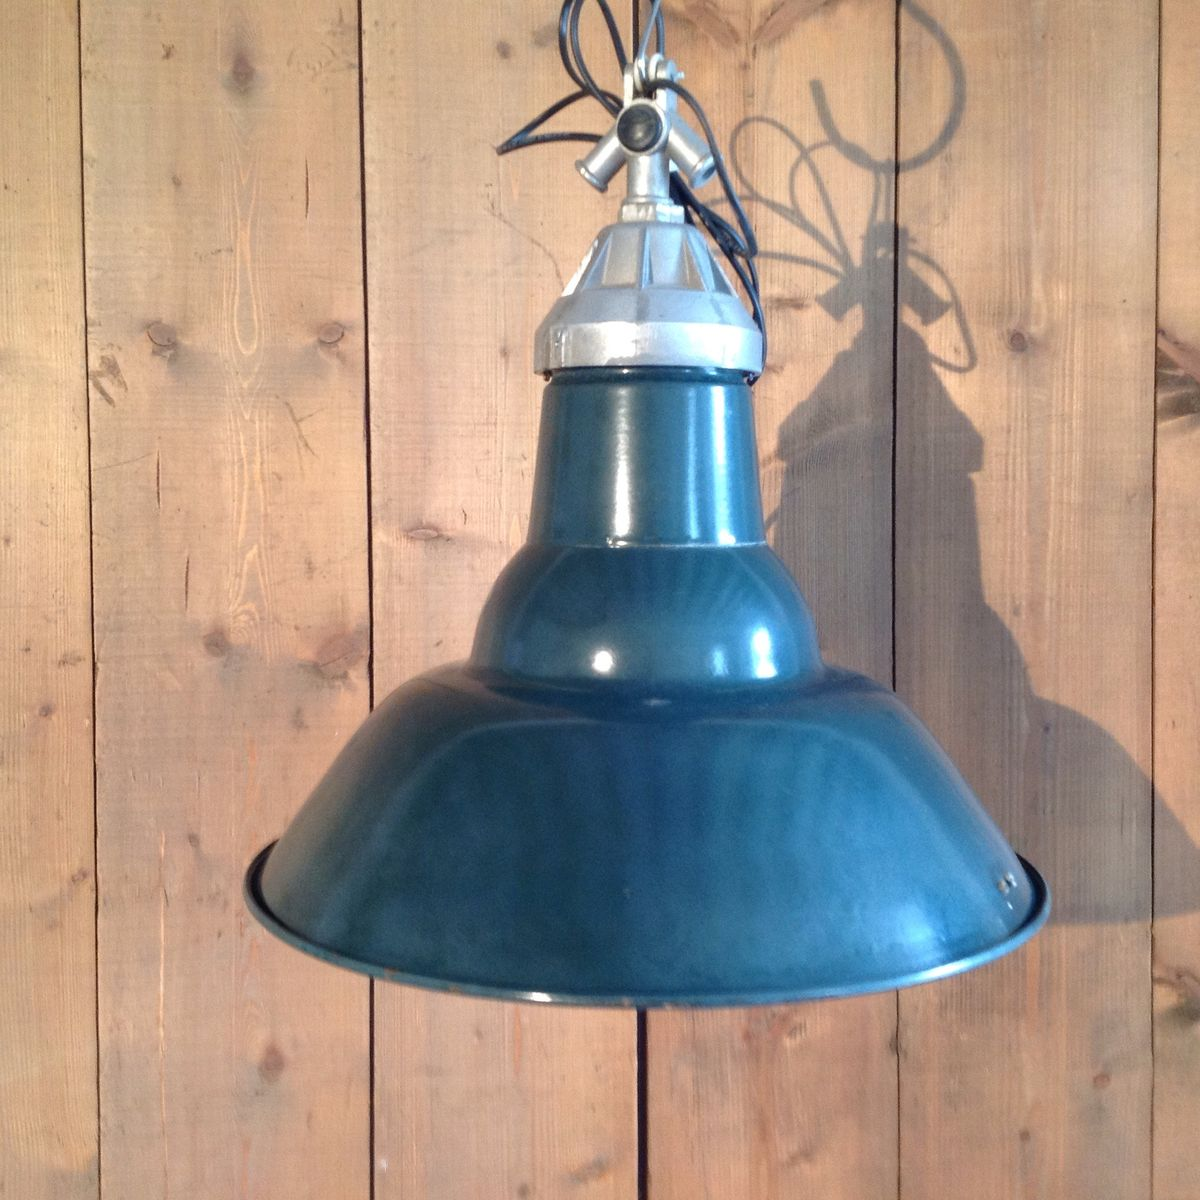 vintage french industrial suspension light for sale at pamono. Black Bedroom Furniture Sets. Home Design Ideas